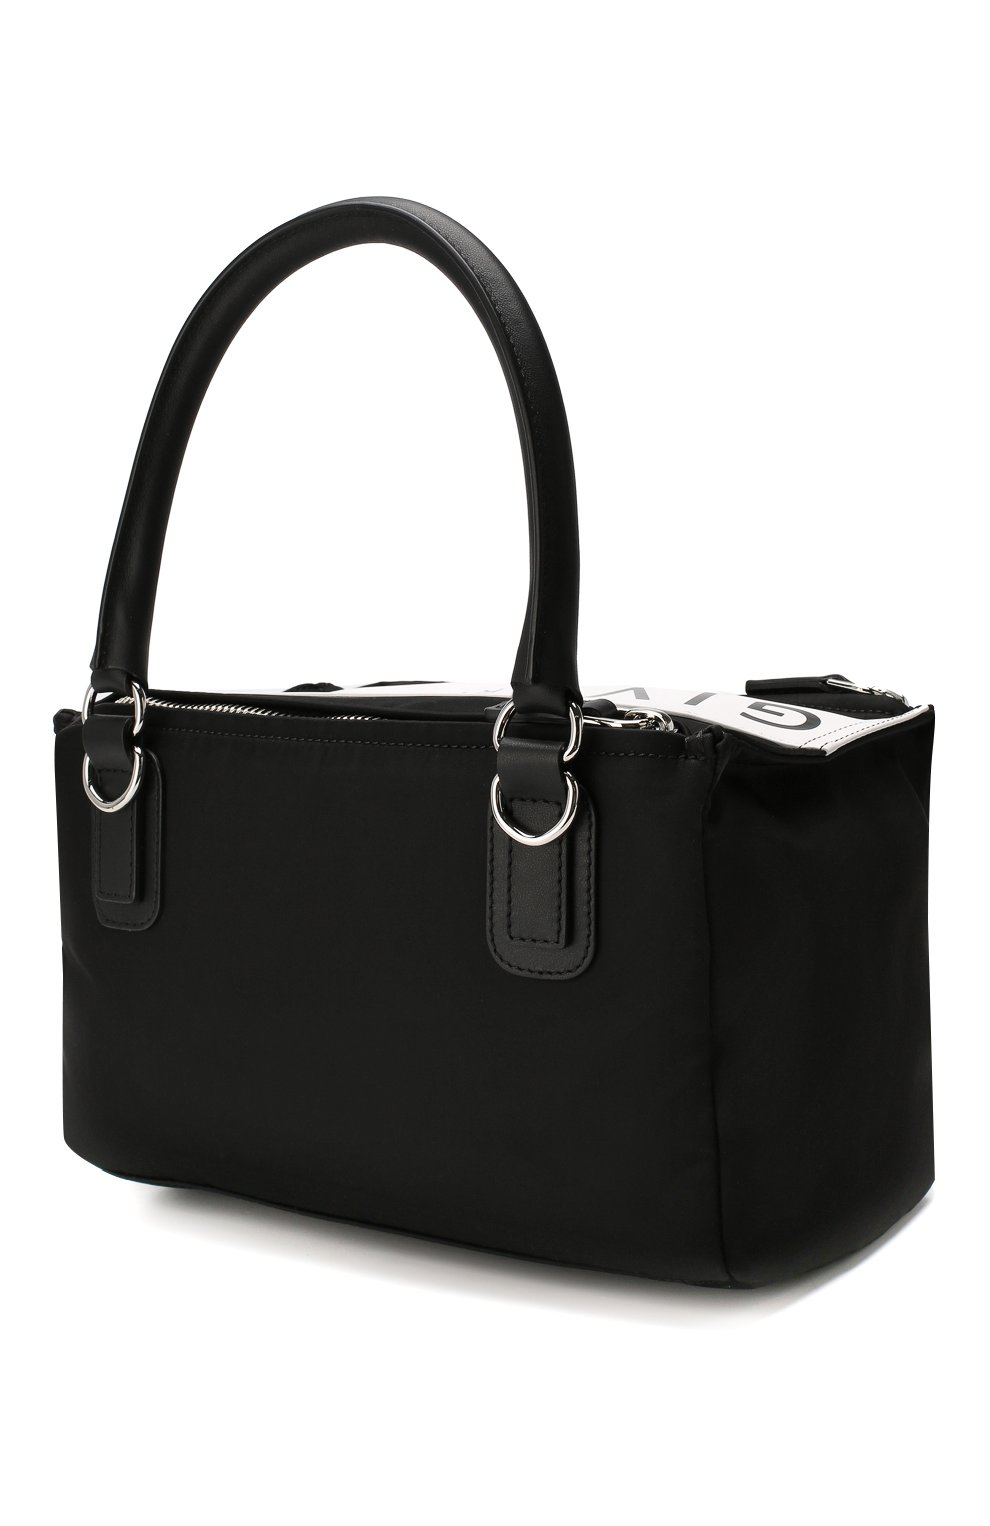 Сумка Pandora small Givenchy черная цвета | Фото №3